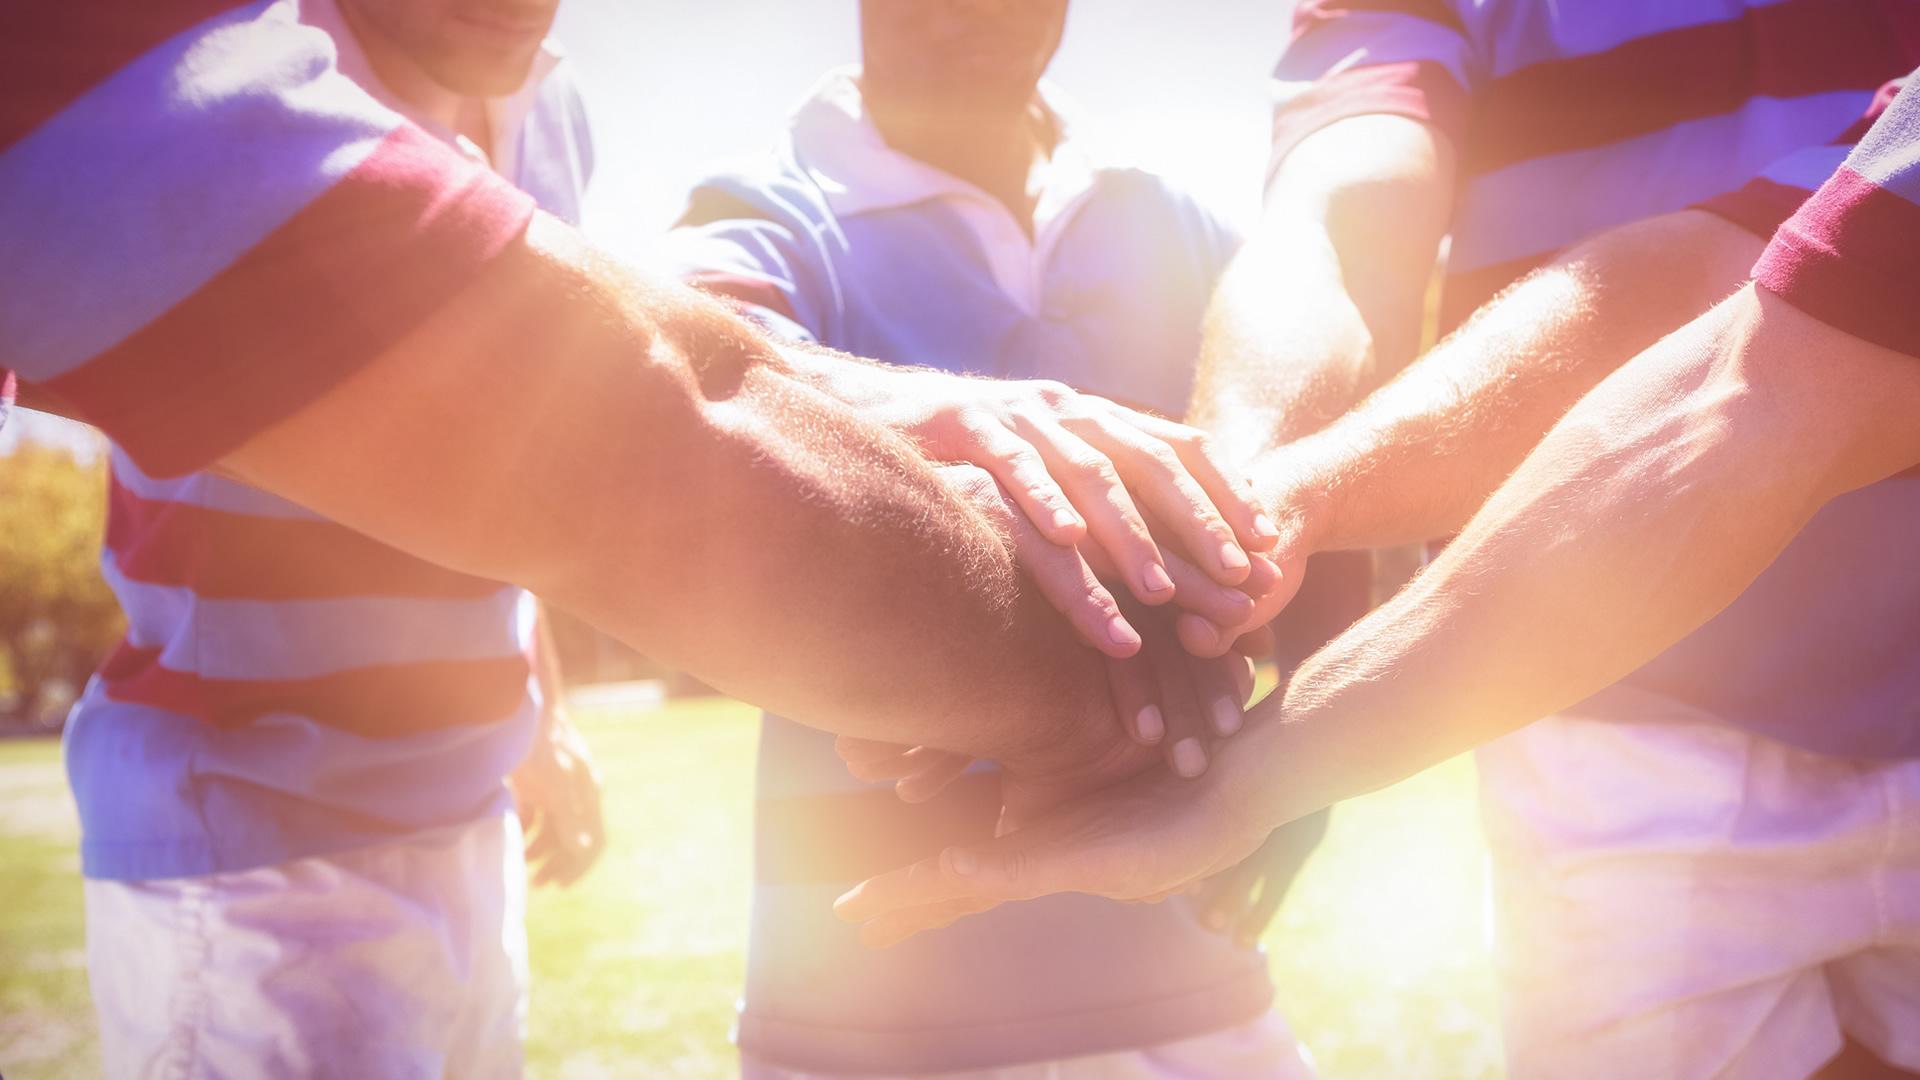 Sports team handshake